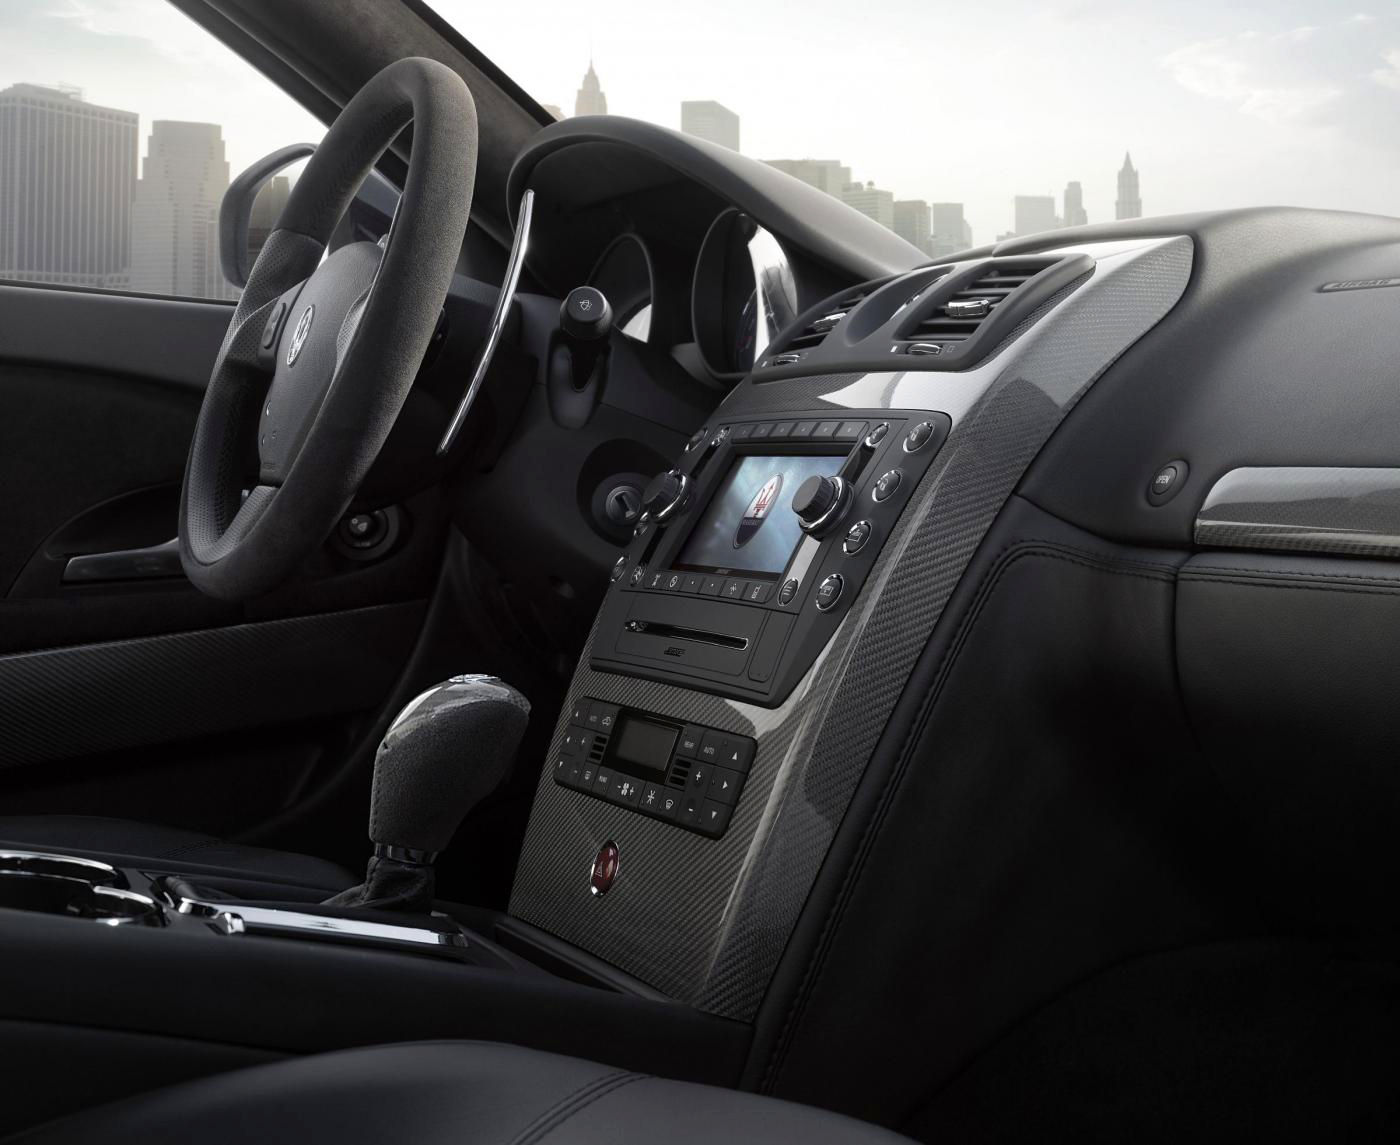 2008 Maserati Quattroporte V Restyling - interior details of the 4-door sedan